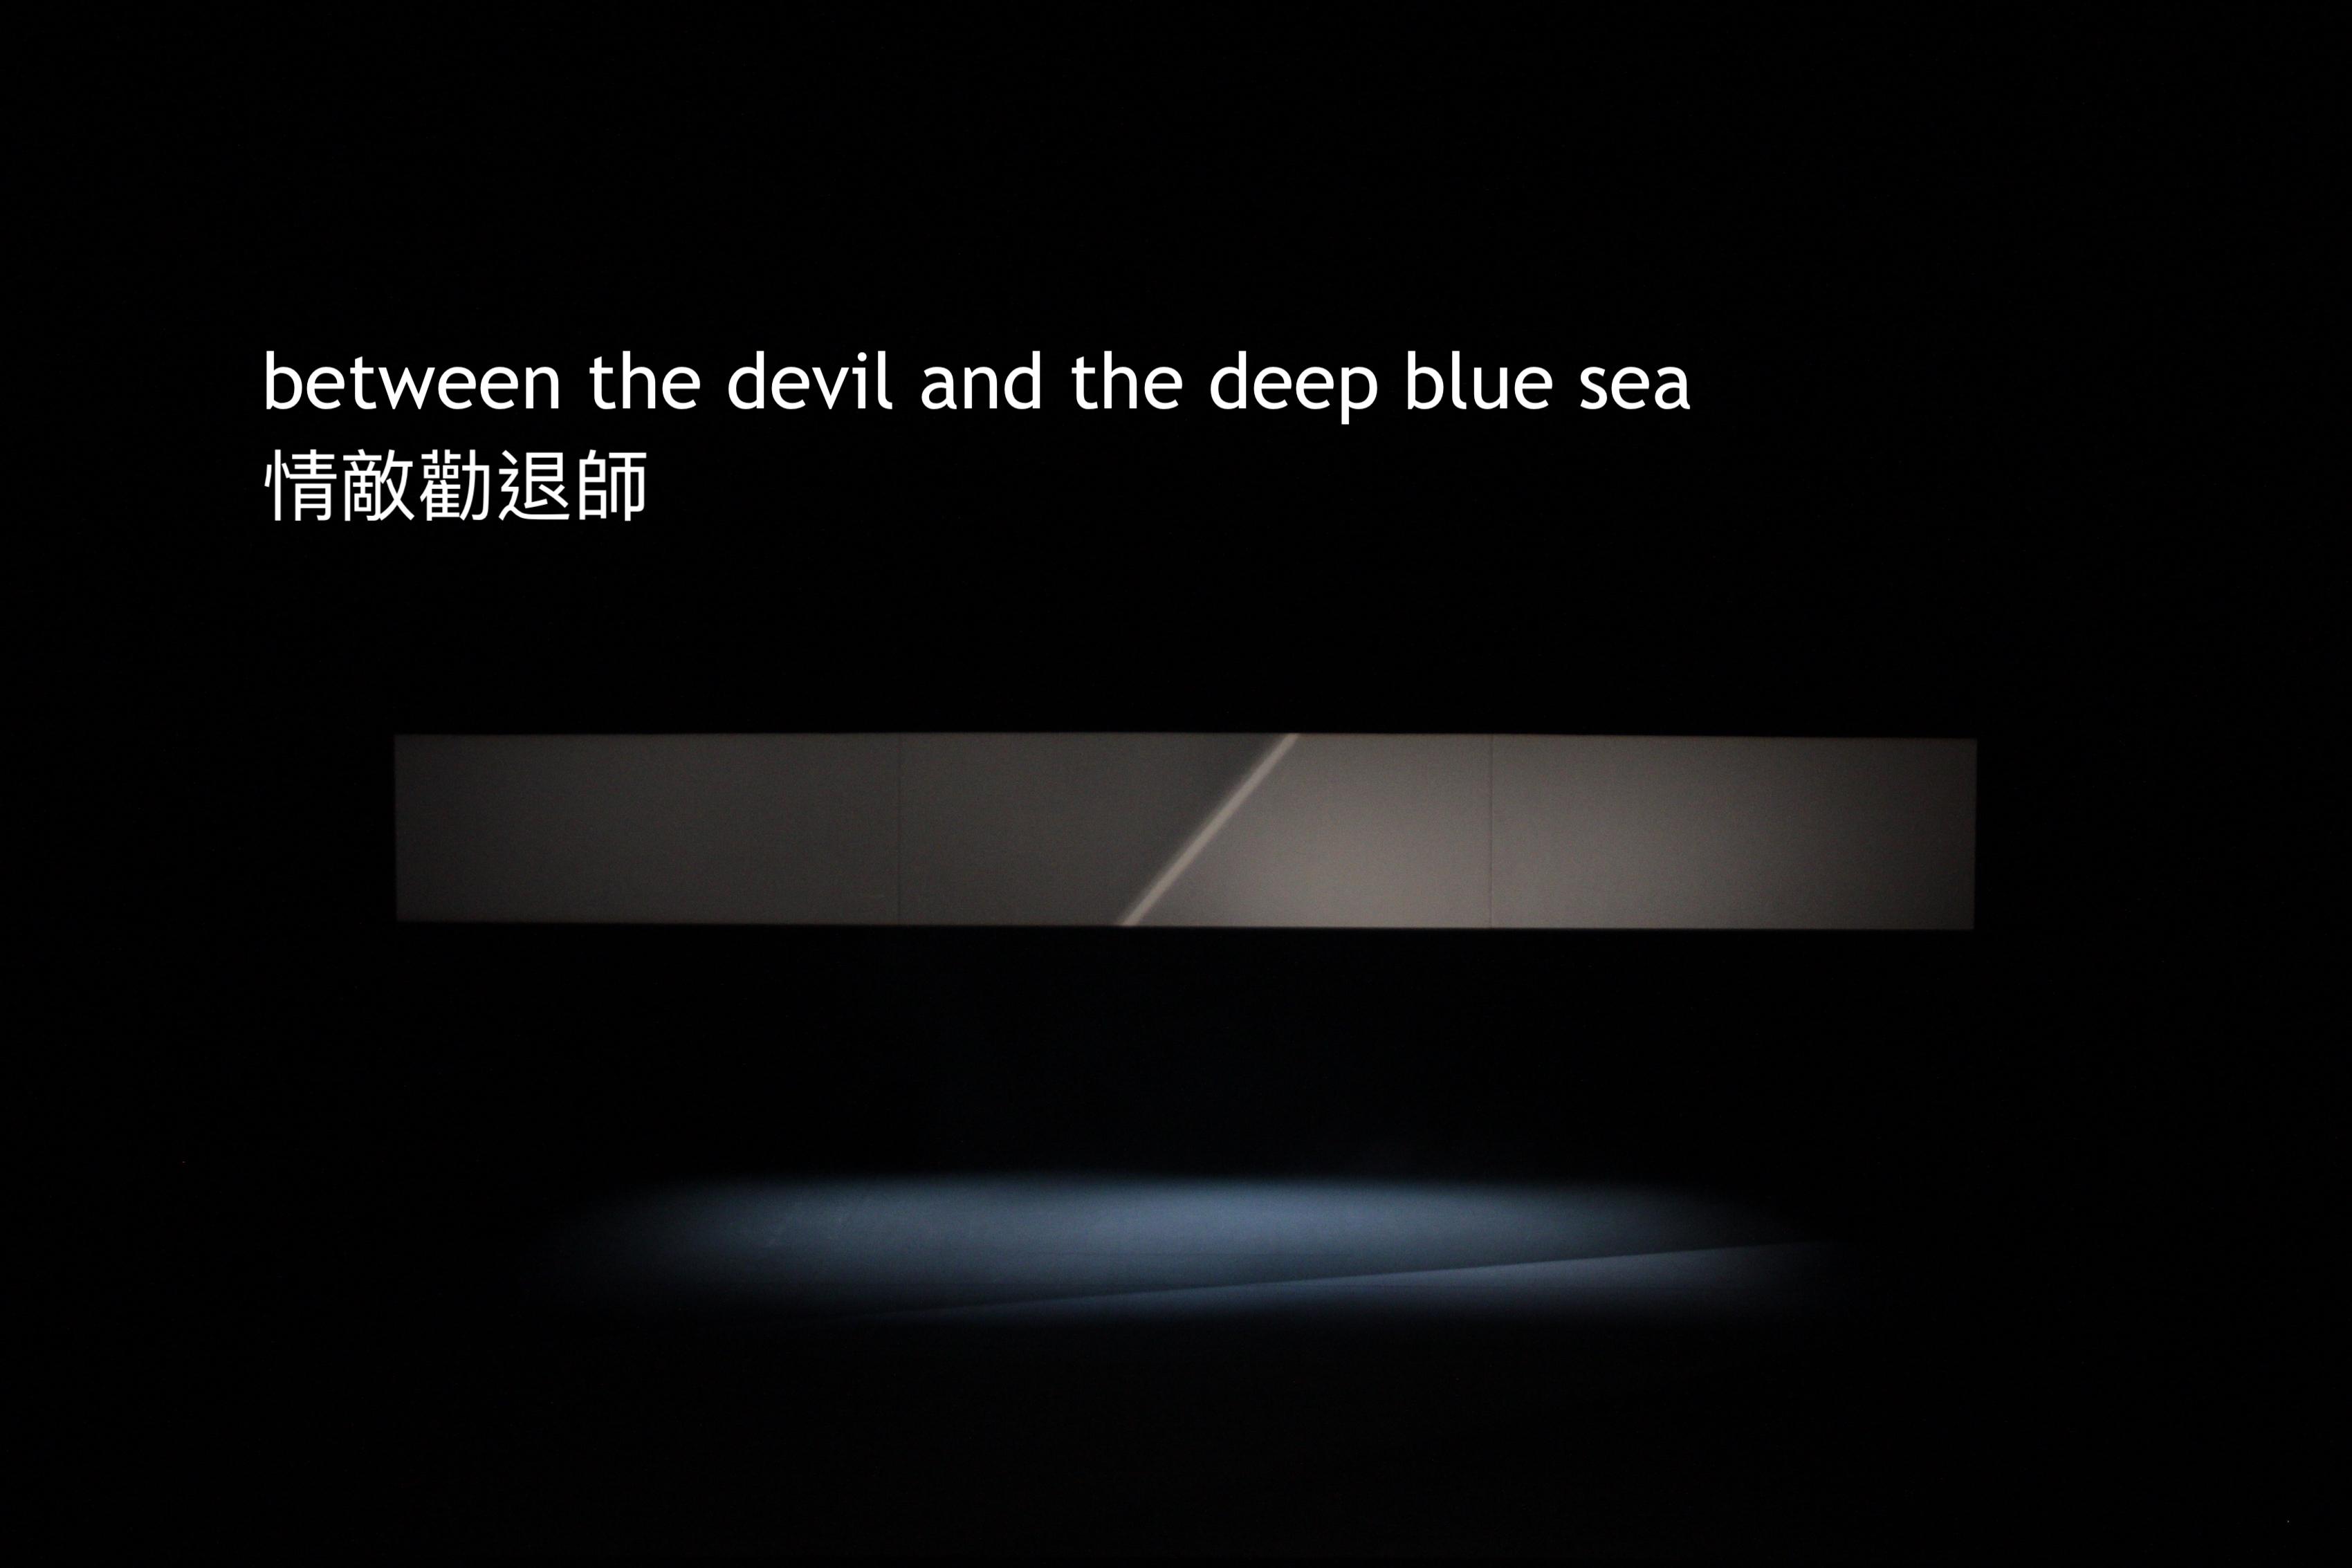 DEVILS_JPEG__001 copy 2